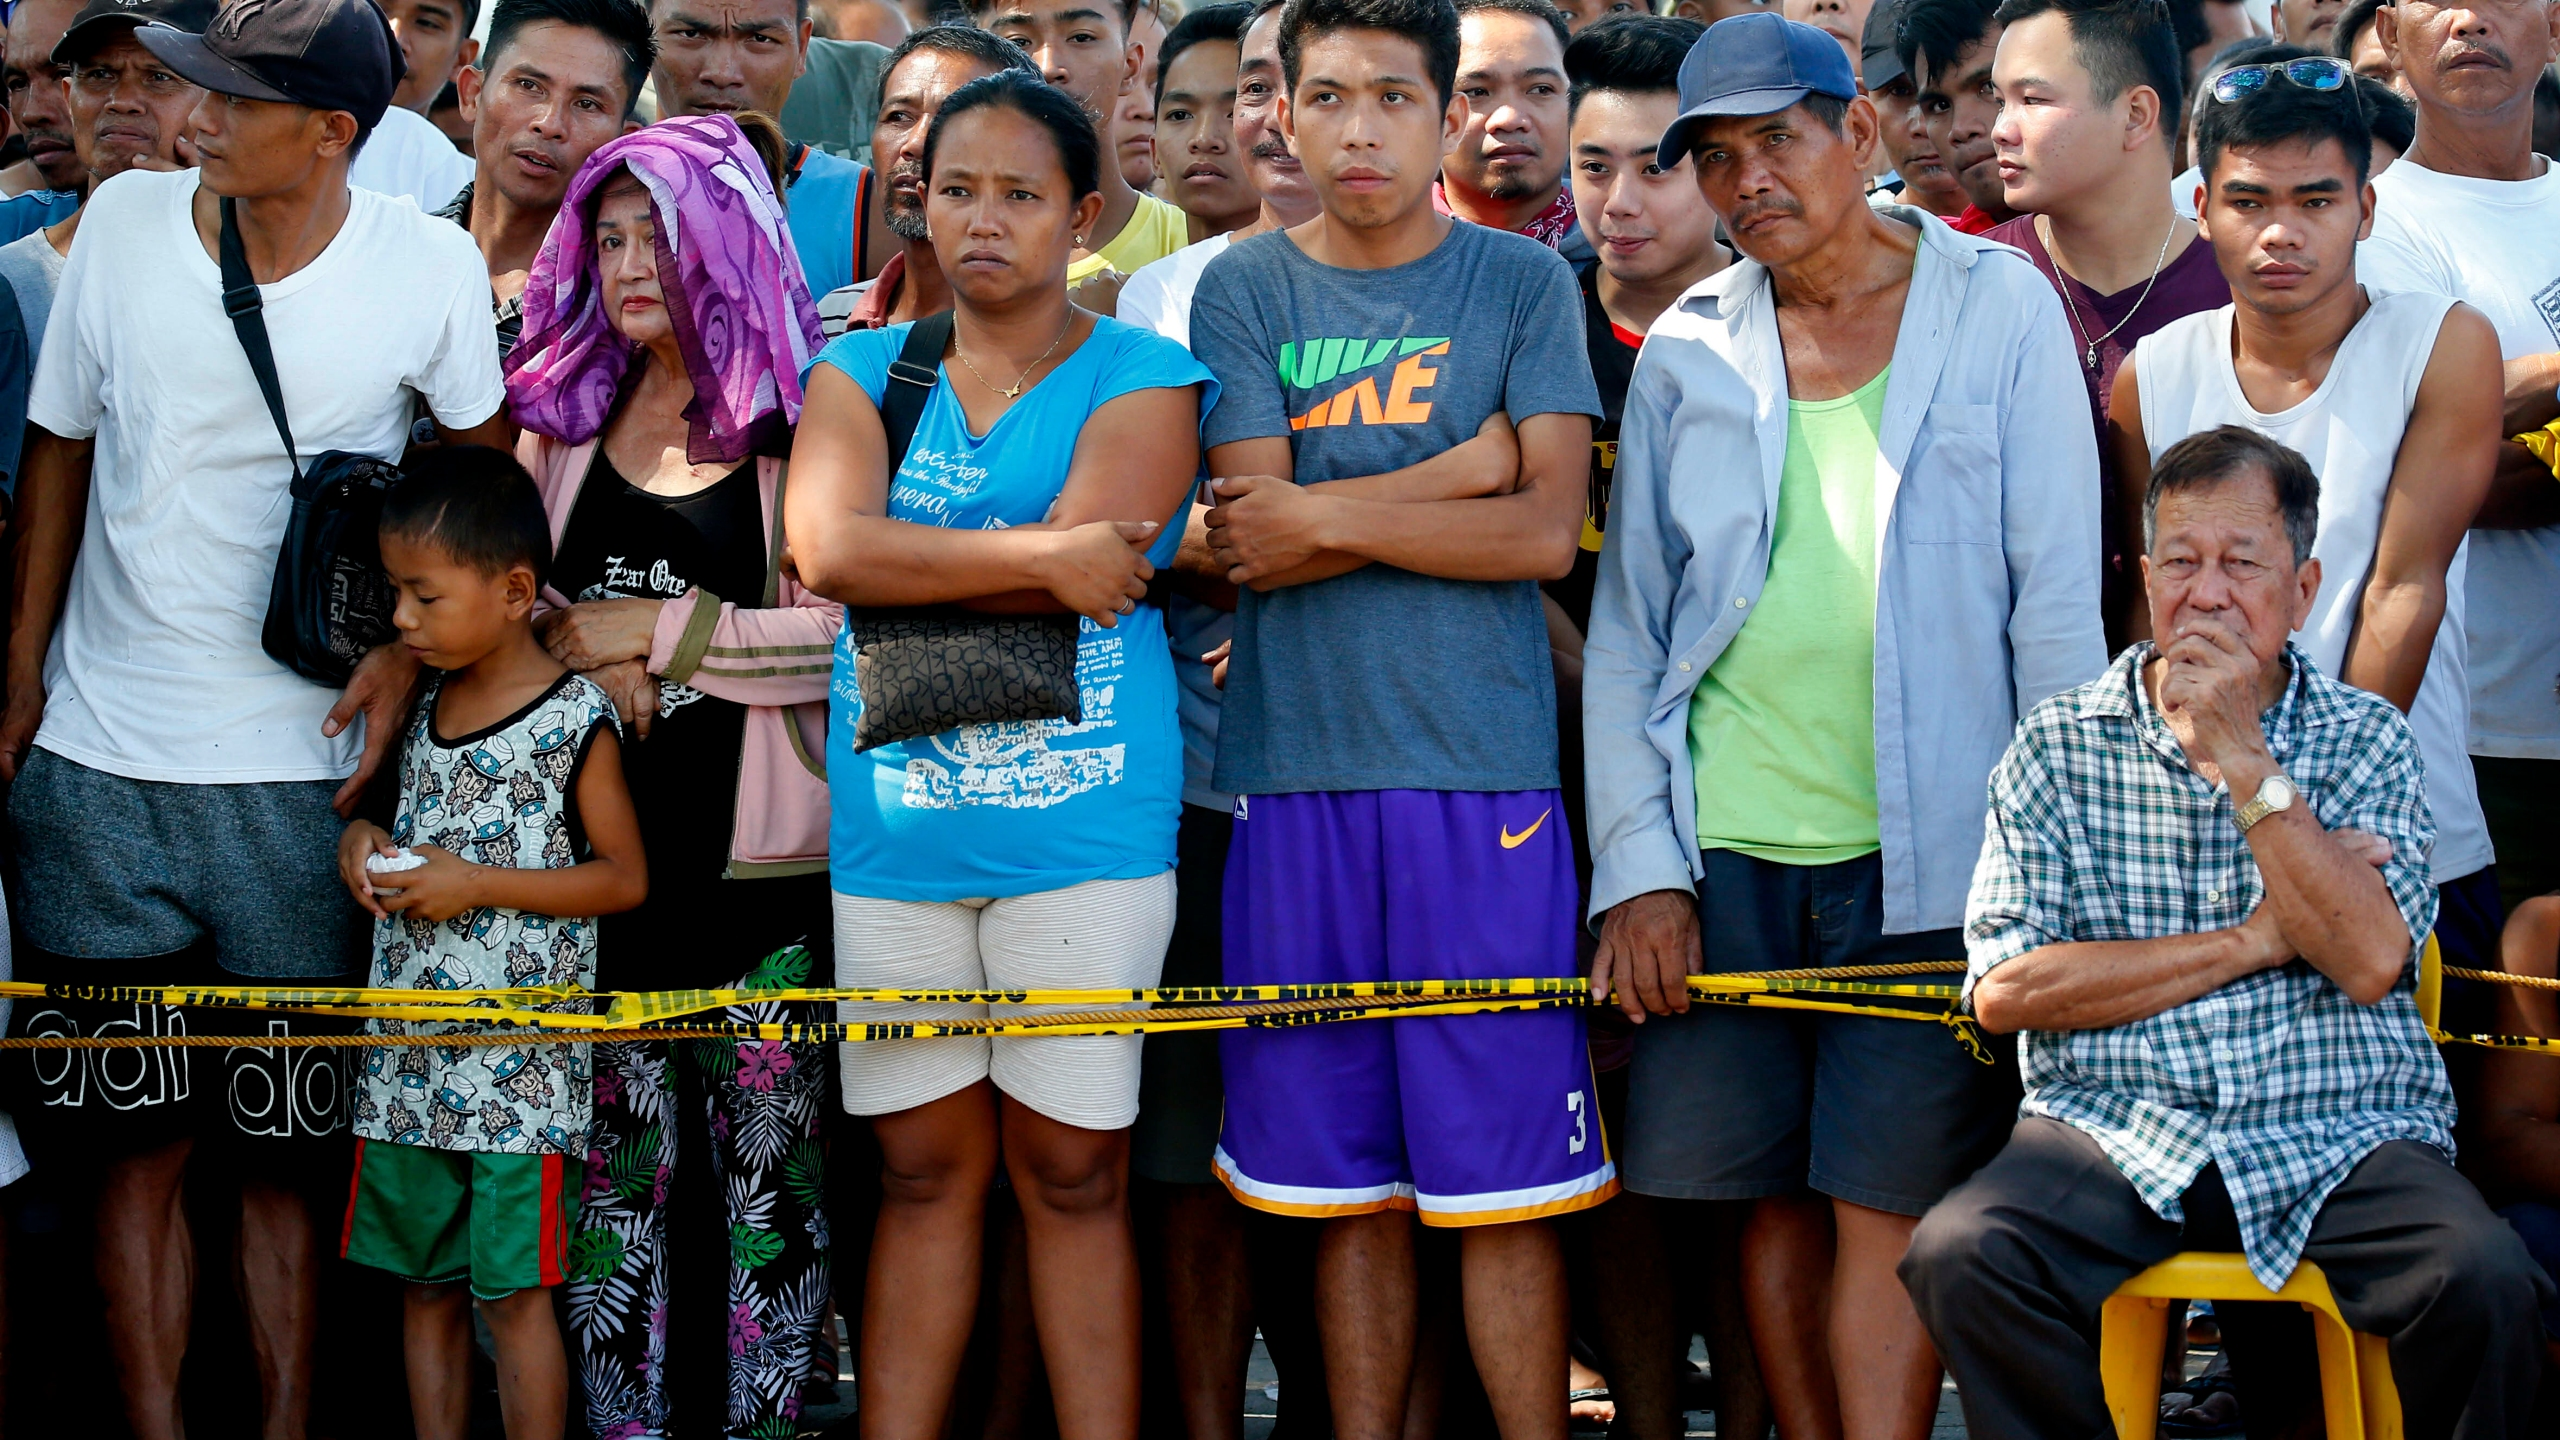 Philippines_Earthquake_45612-159532.jpg84340725